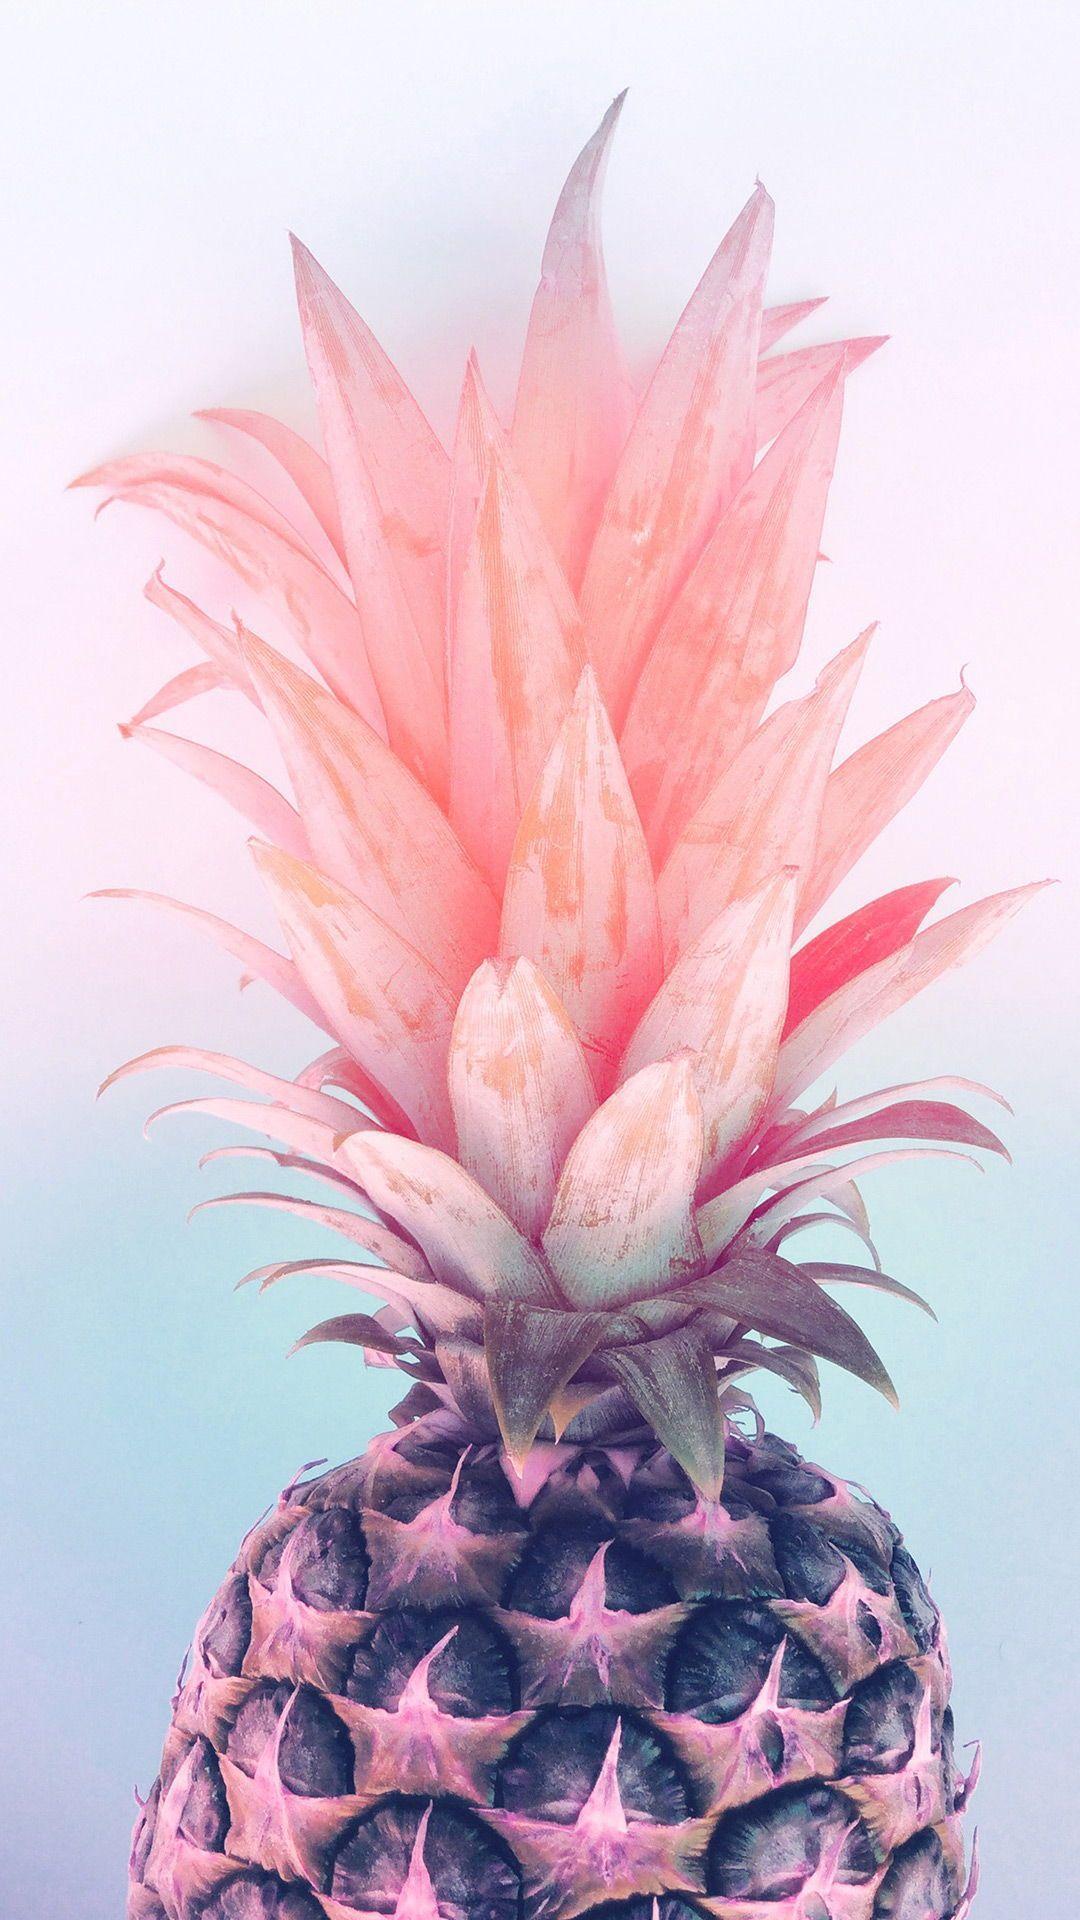 """Pastel Pineapple"" design by Emanuela Carratoni makes a"